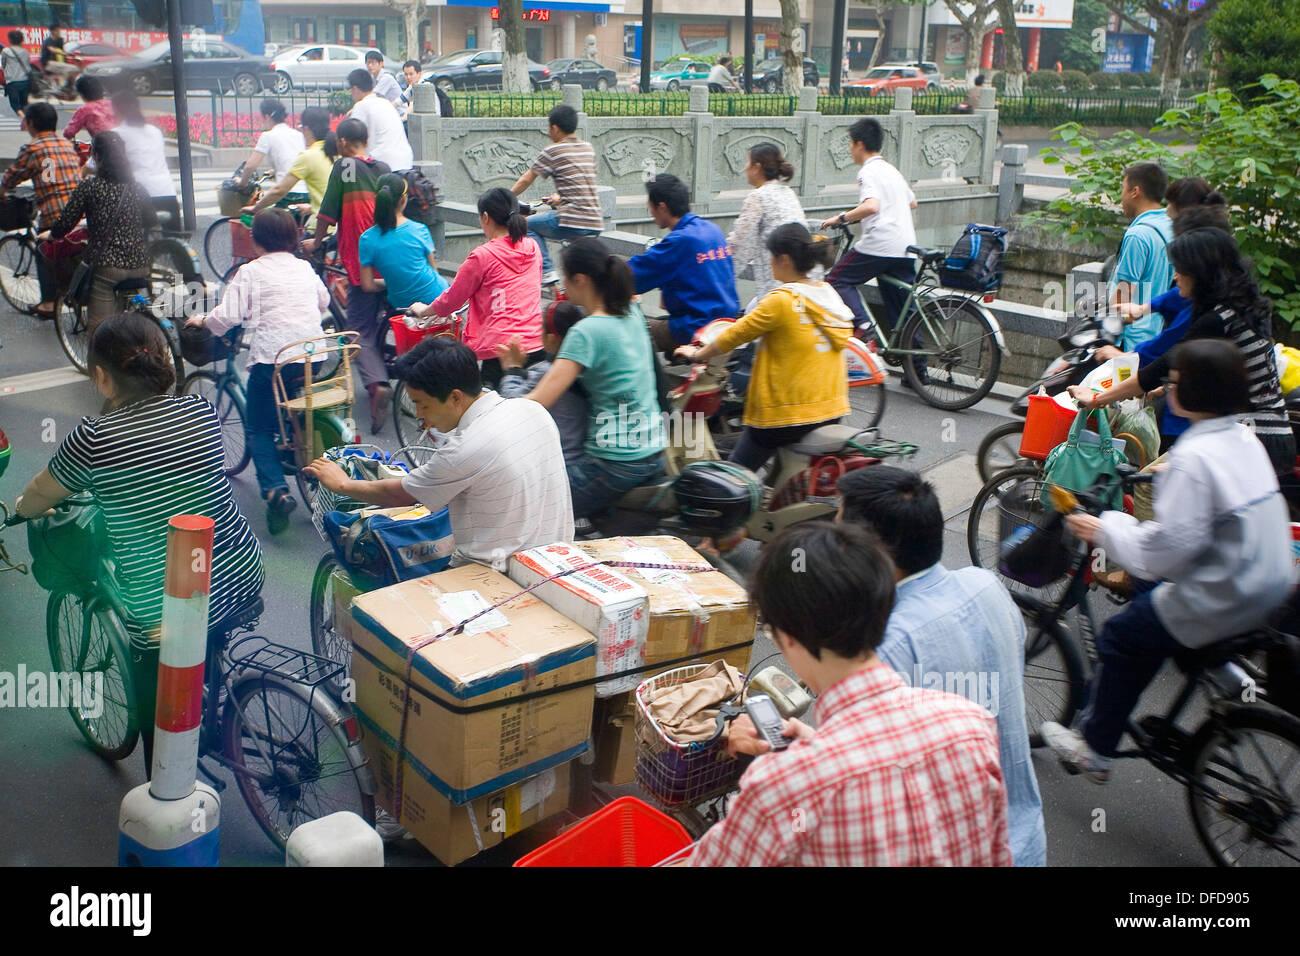 China, Hangzhou, two-wheeled transport - Stock Image